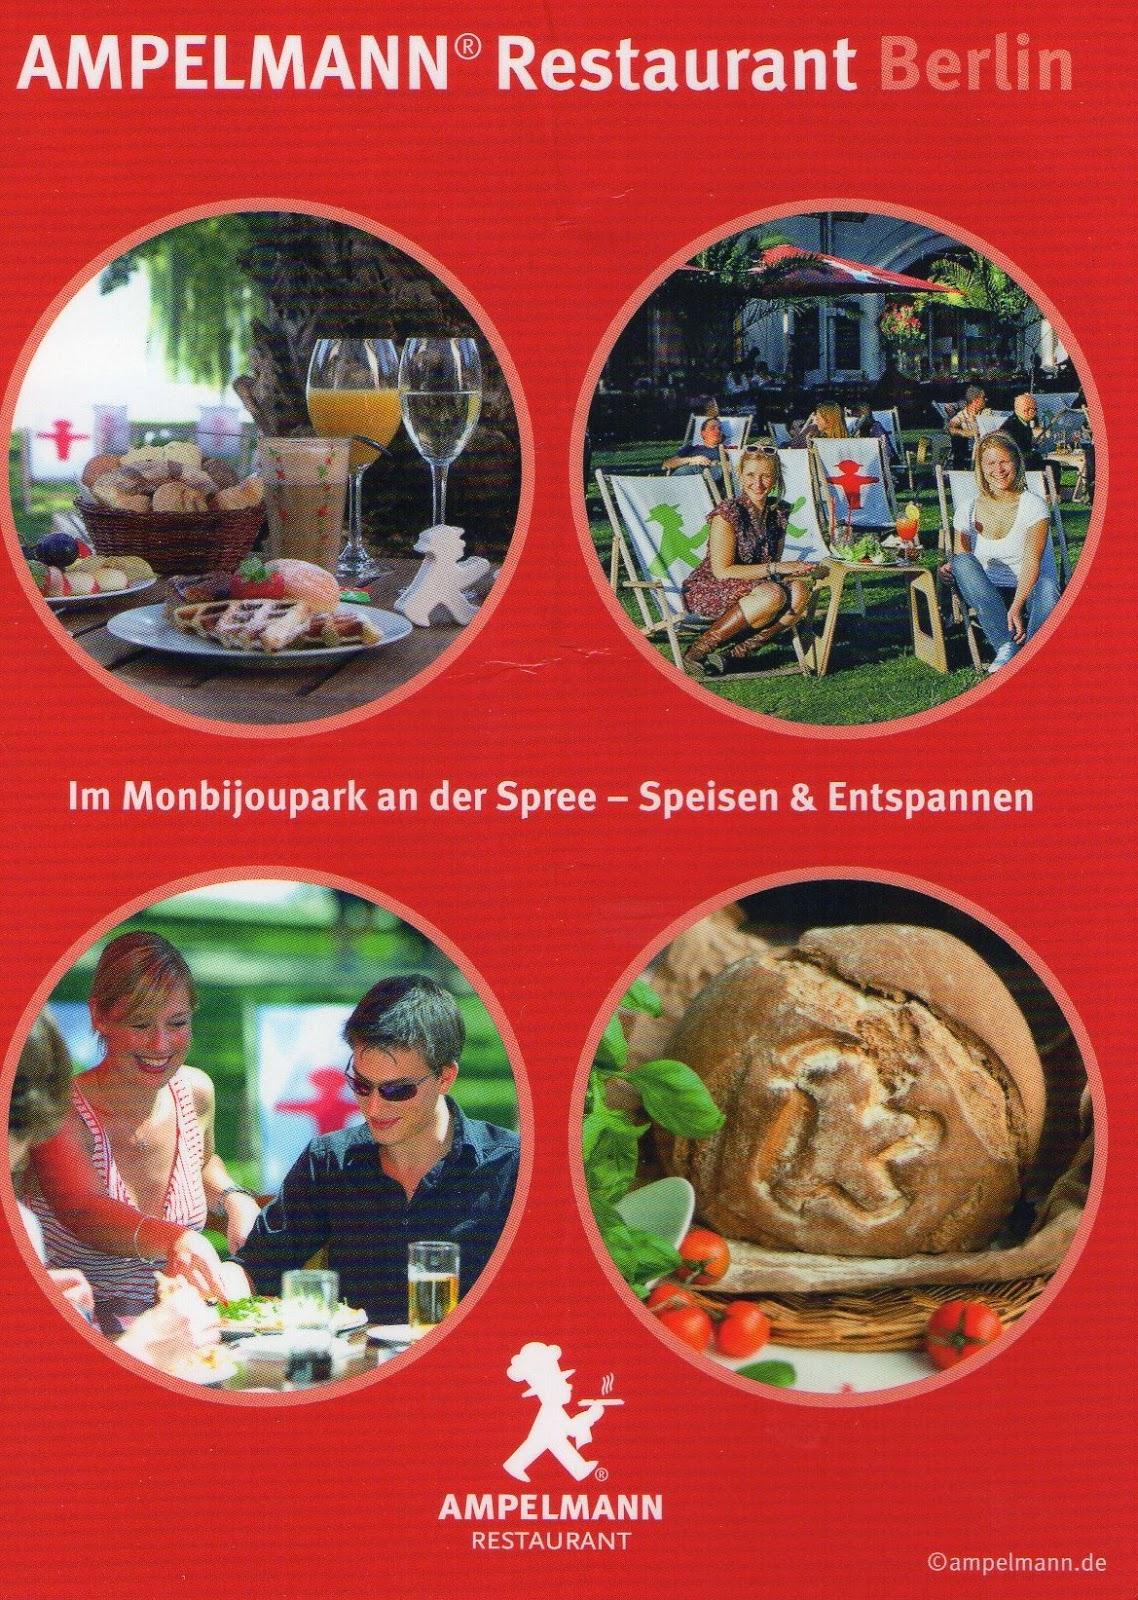 restaurante Ampelmann em Berlim